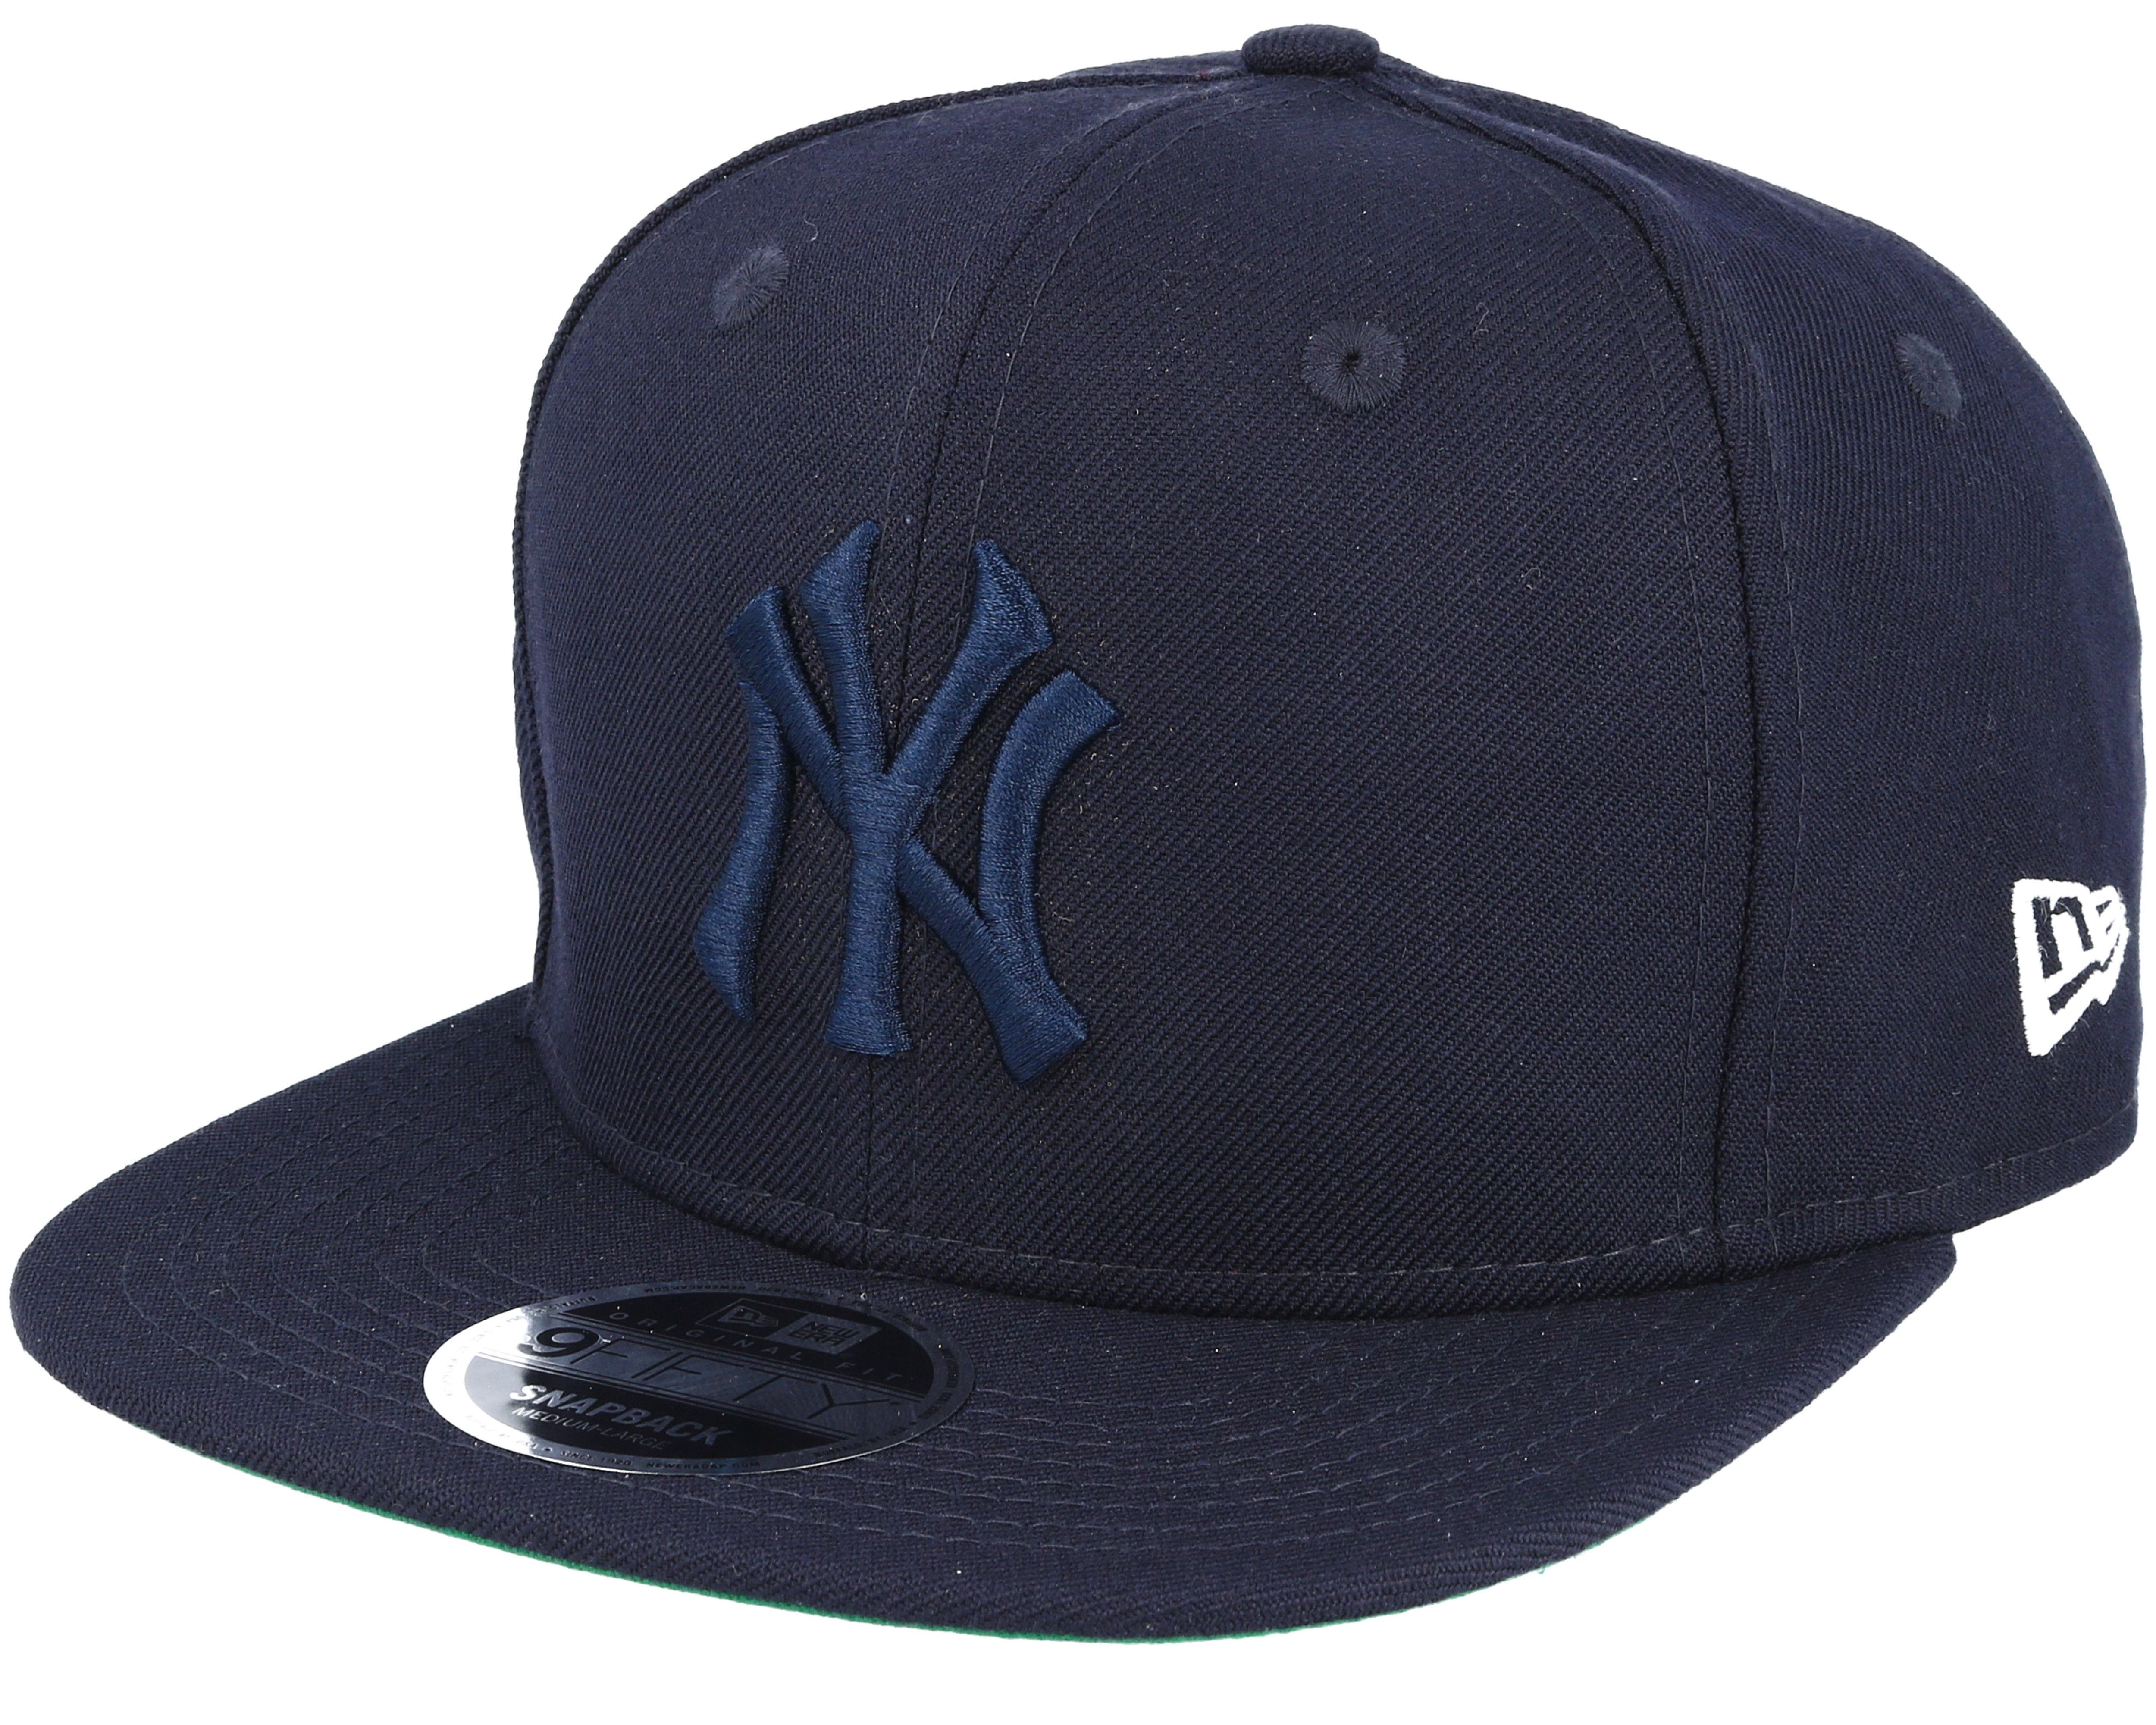 new york yankees winners patch navy snapback new era cap. Black Bedroom Furniture Sets. Home Design Ideas